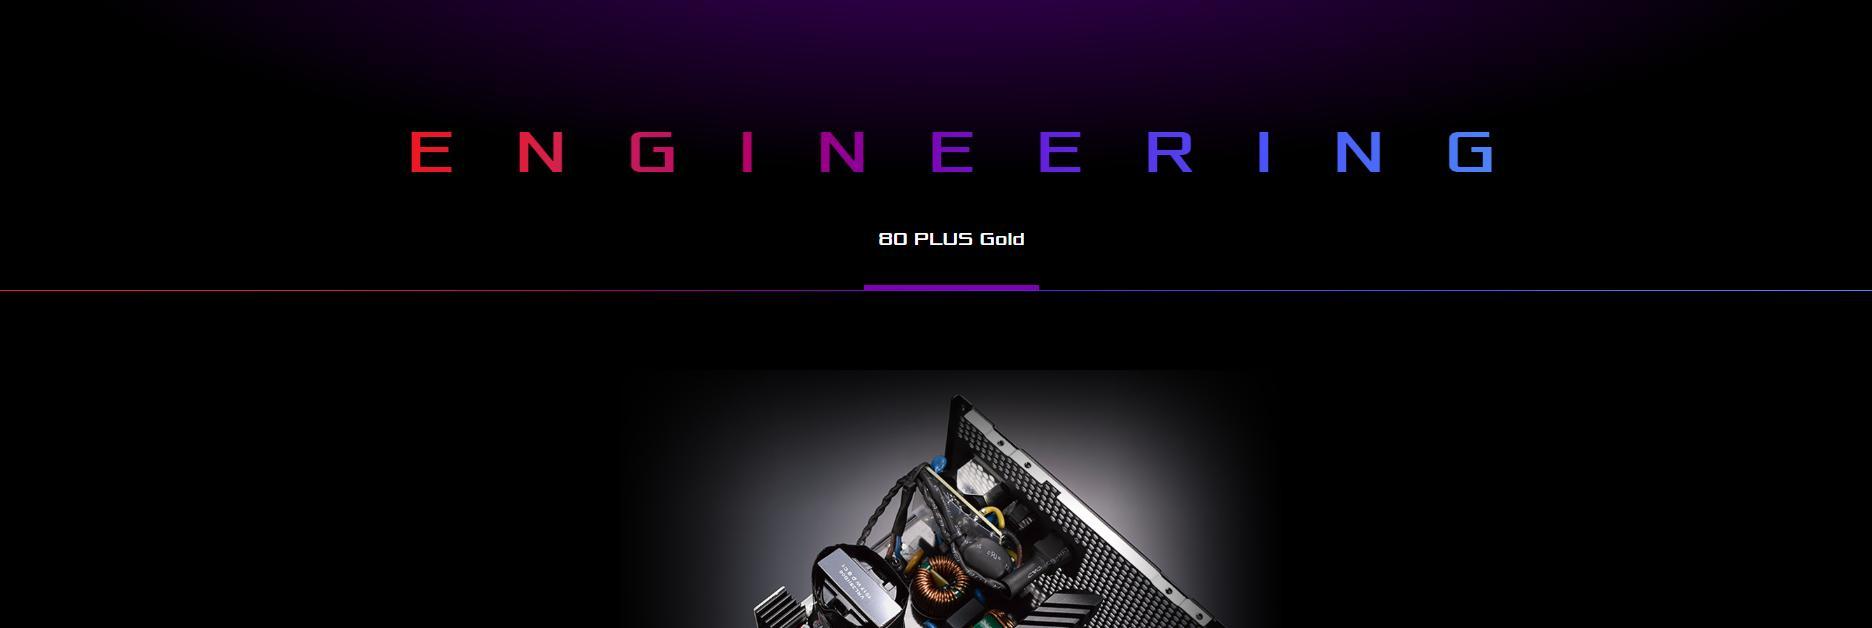 Nguồn Asus ROG Strix 650W Gold - 650W 80 Plus Gold Full Modular giới thiệu 4